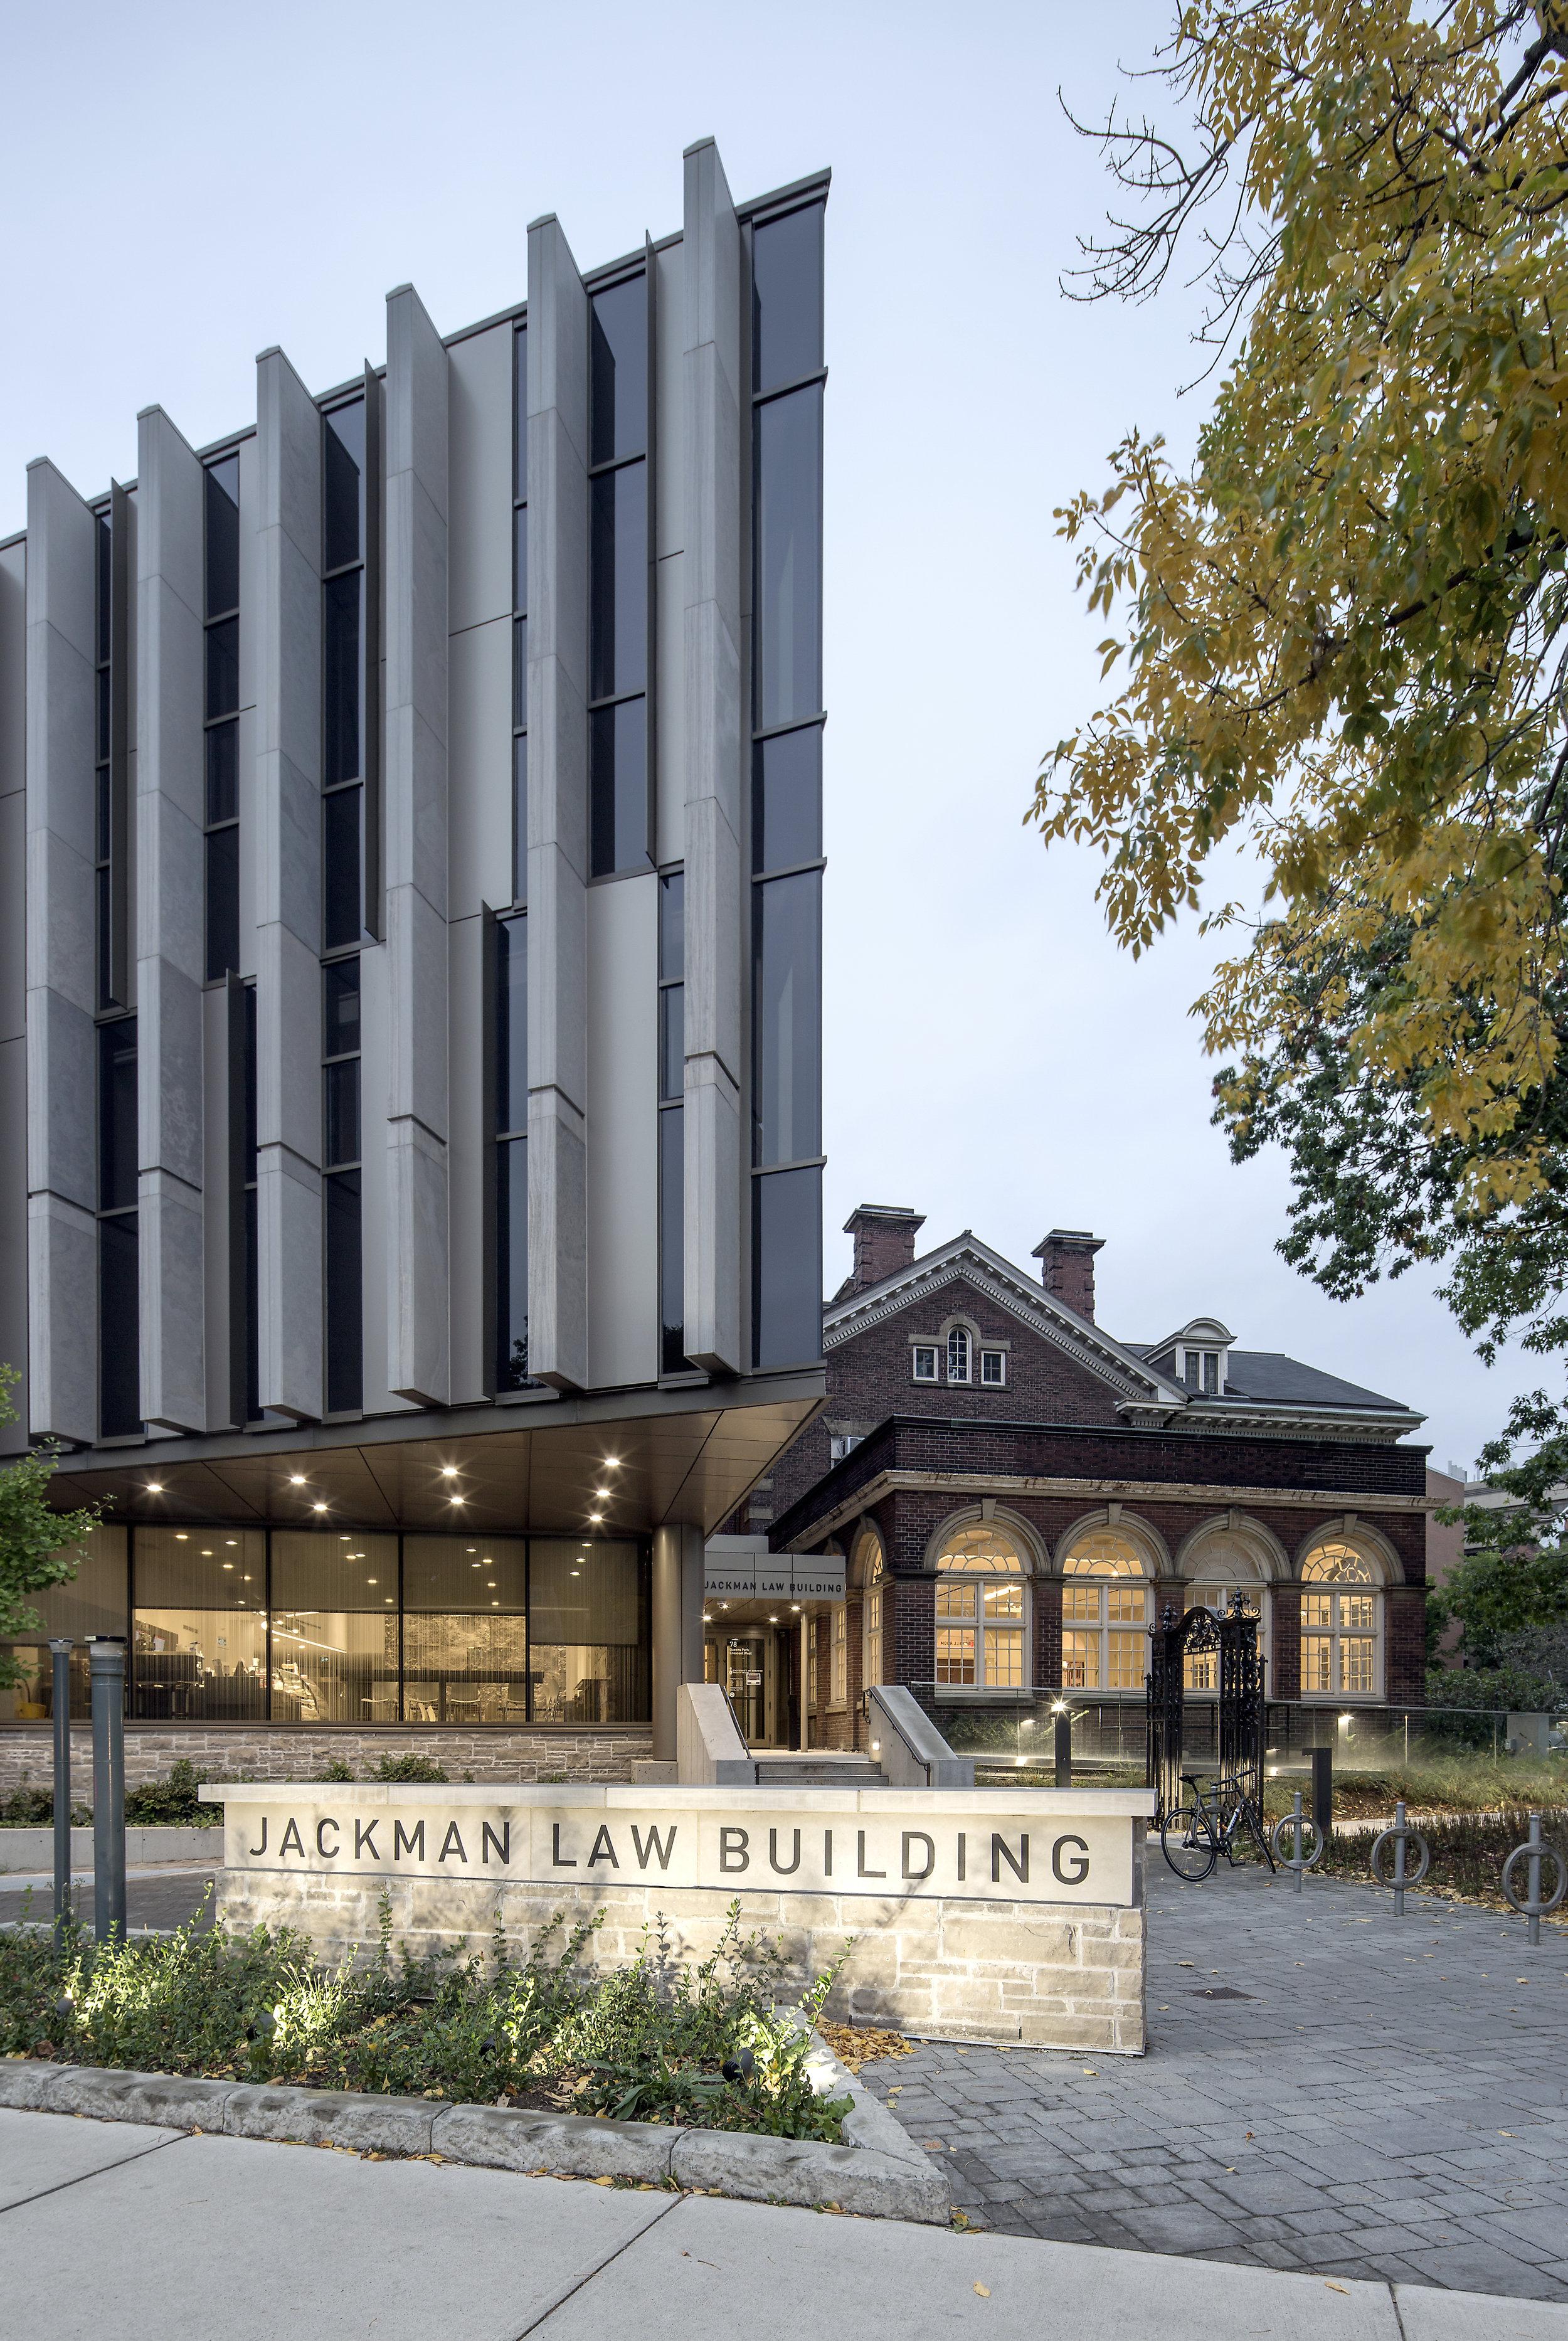 Jackman Law Building